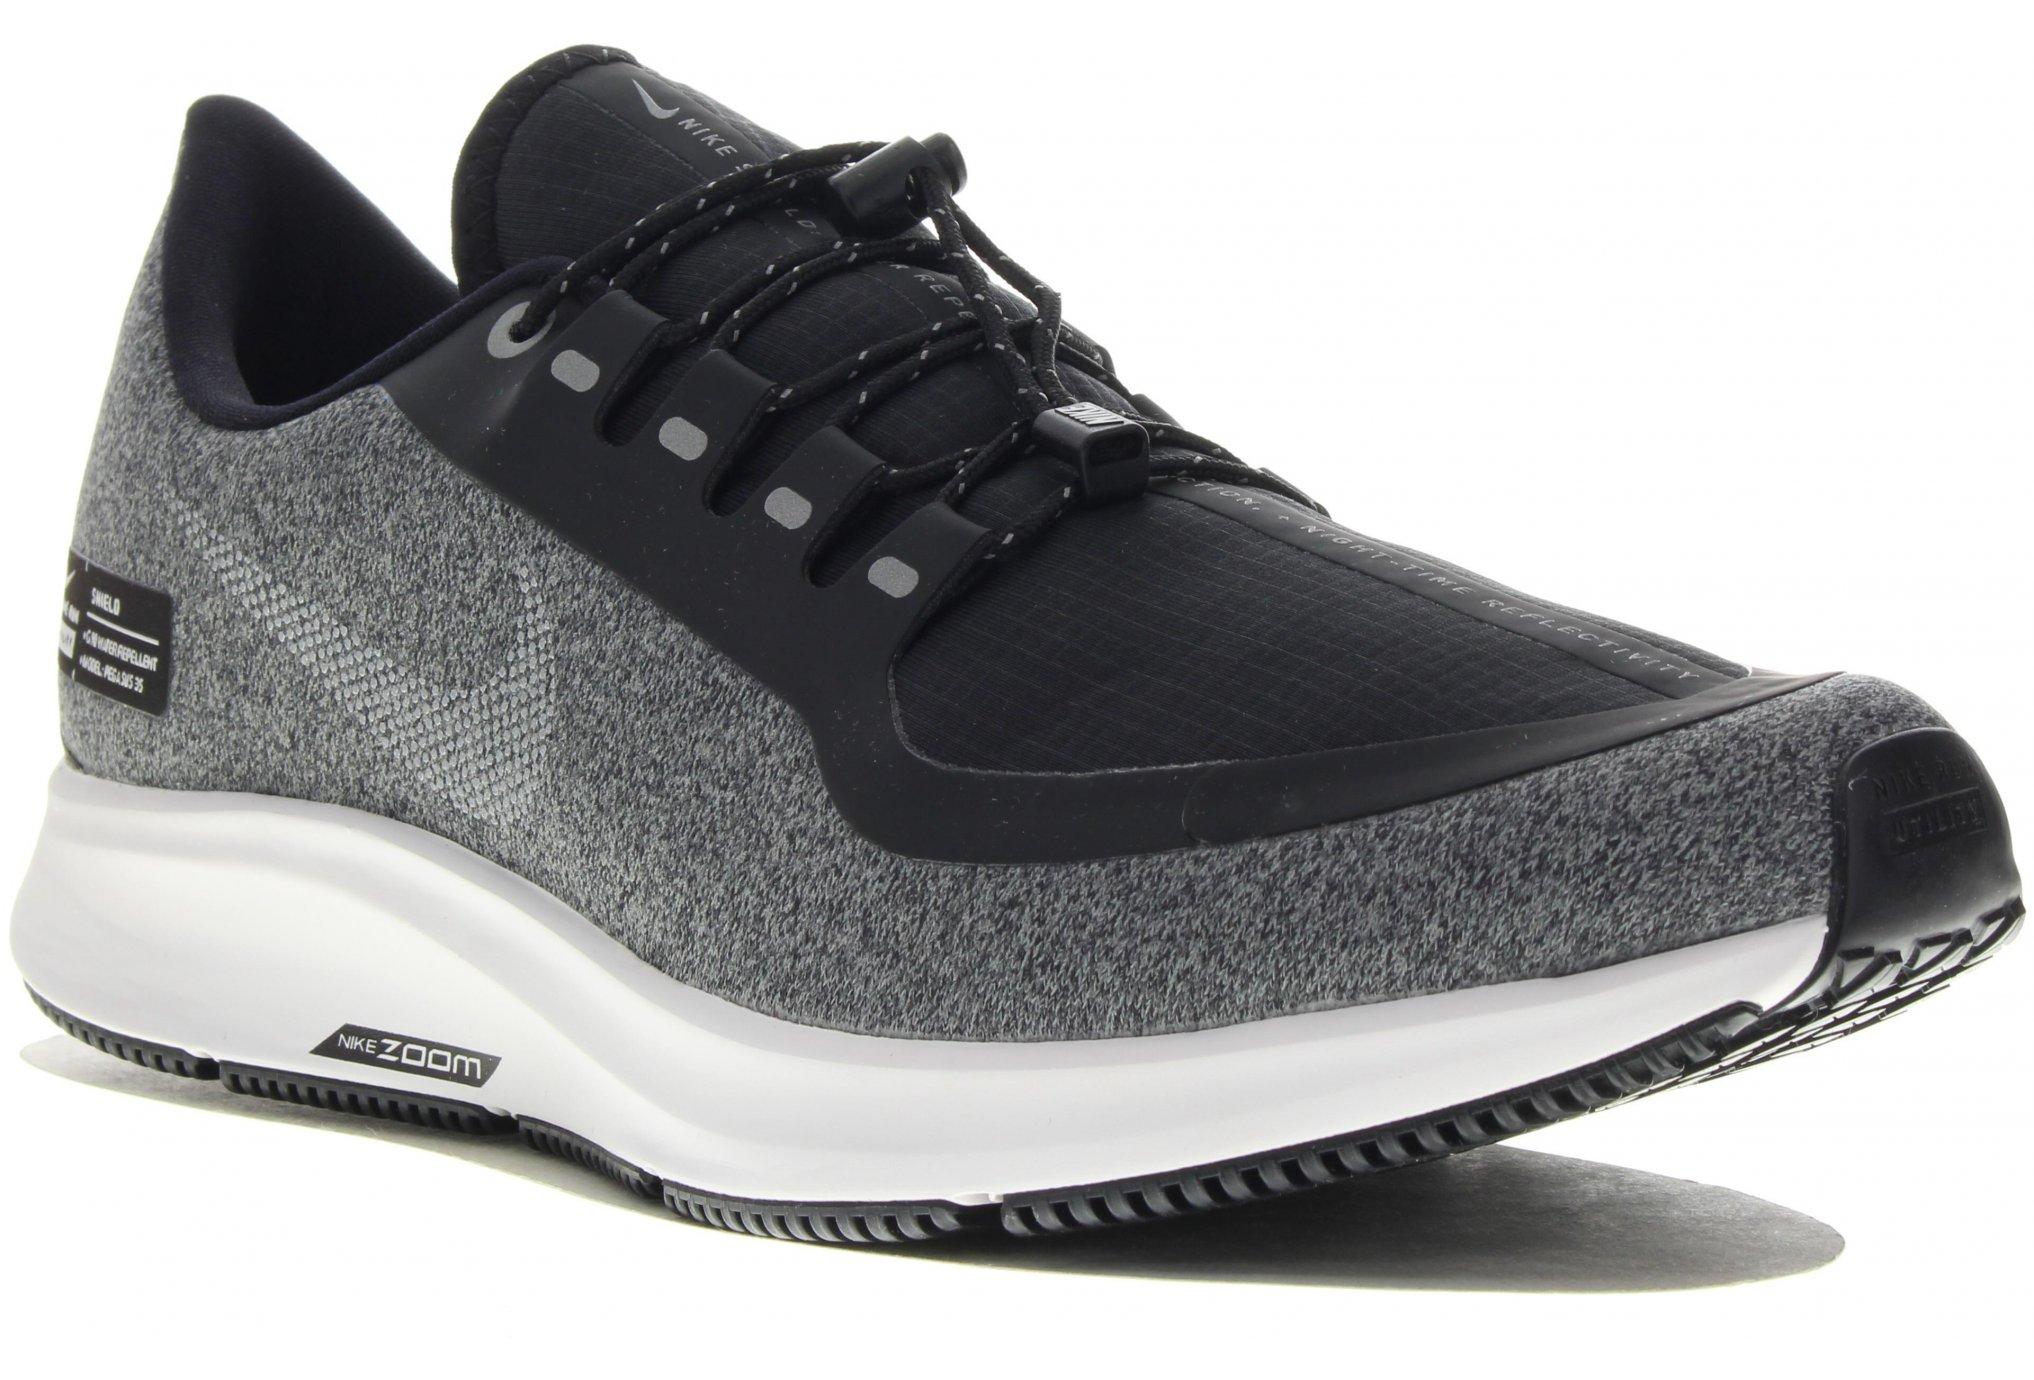 quality design 54296 c6d10 Nike Air Zoom Pegasus 35 Shield M Chaussures homme